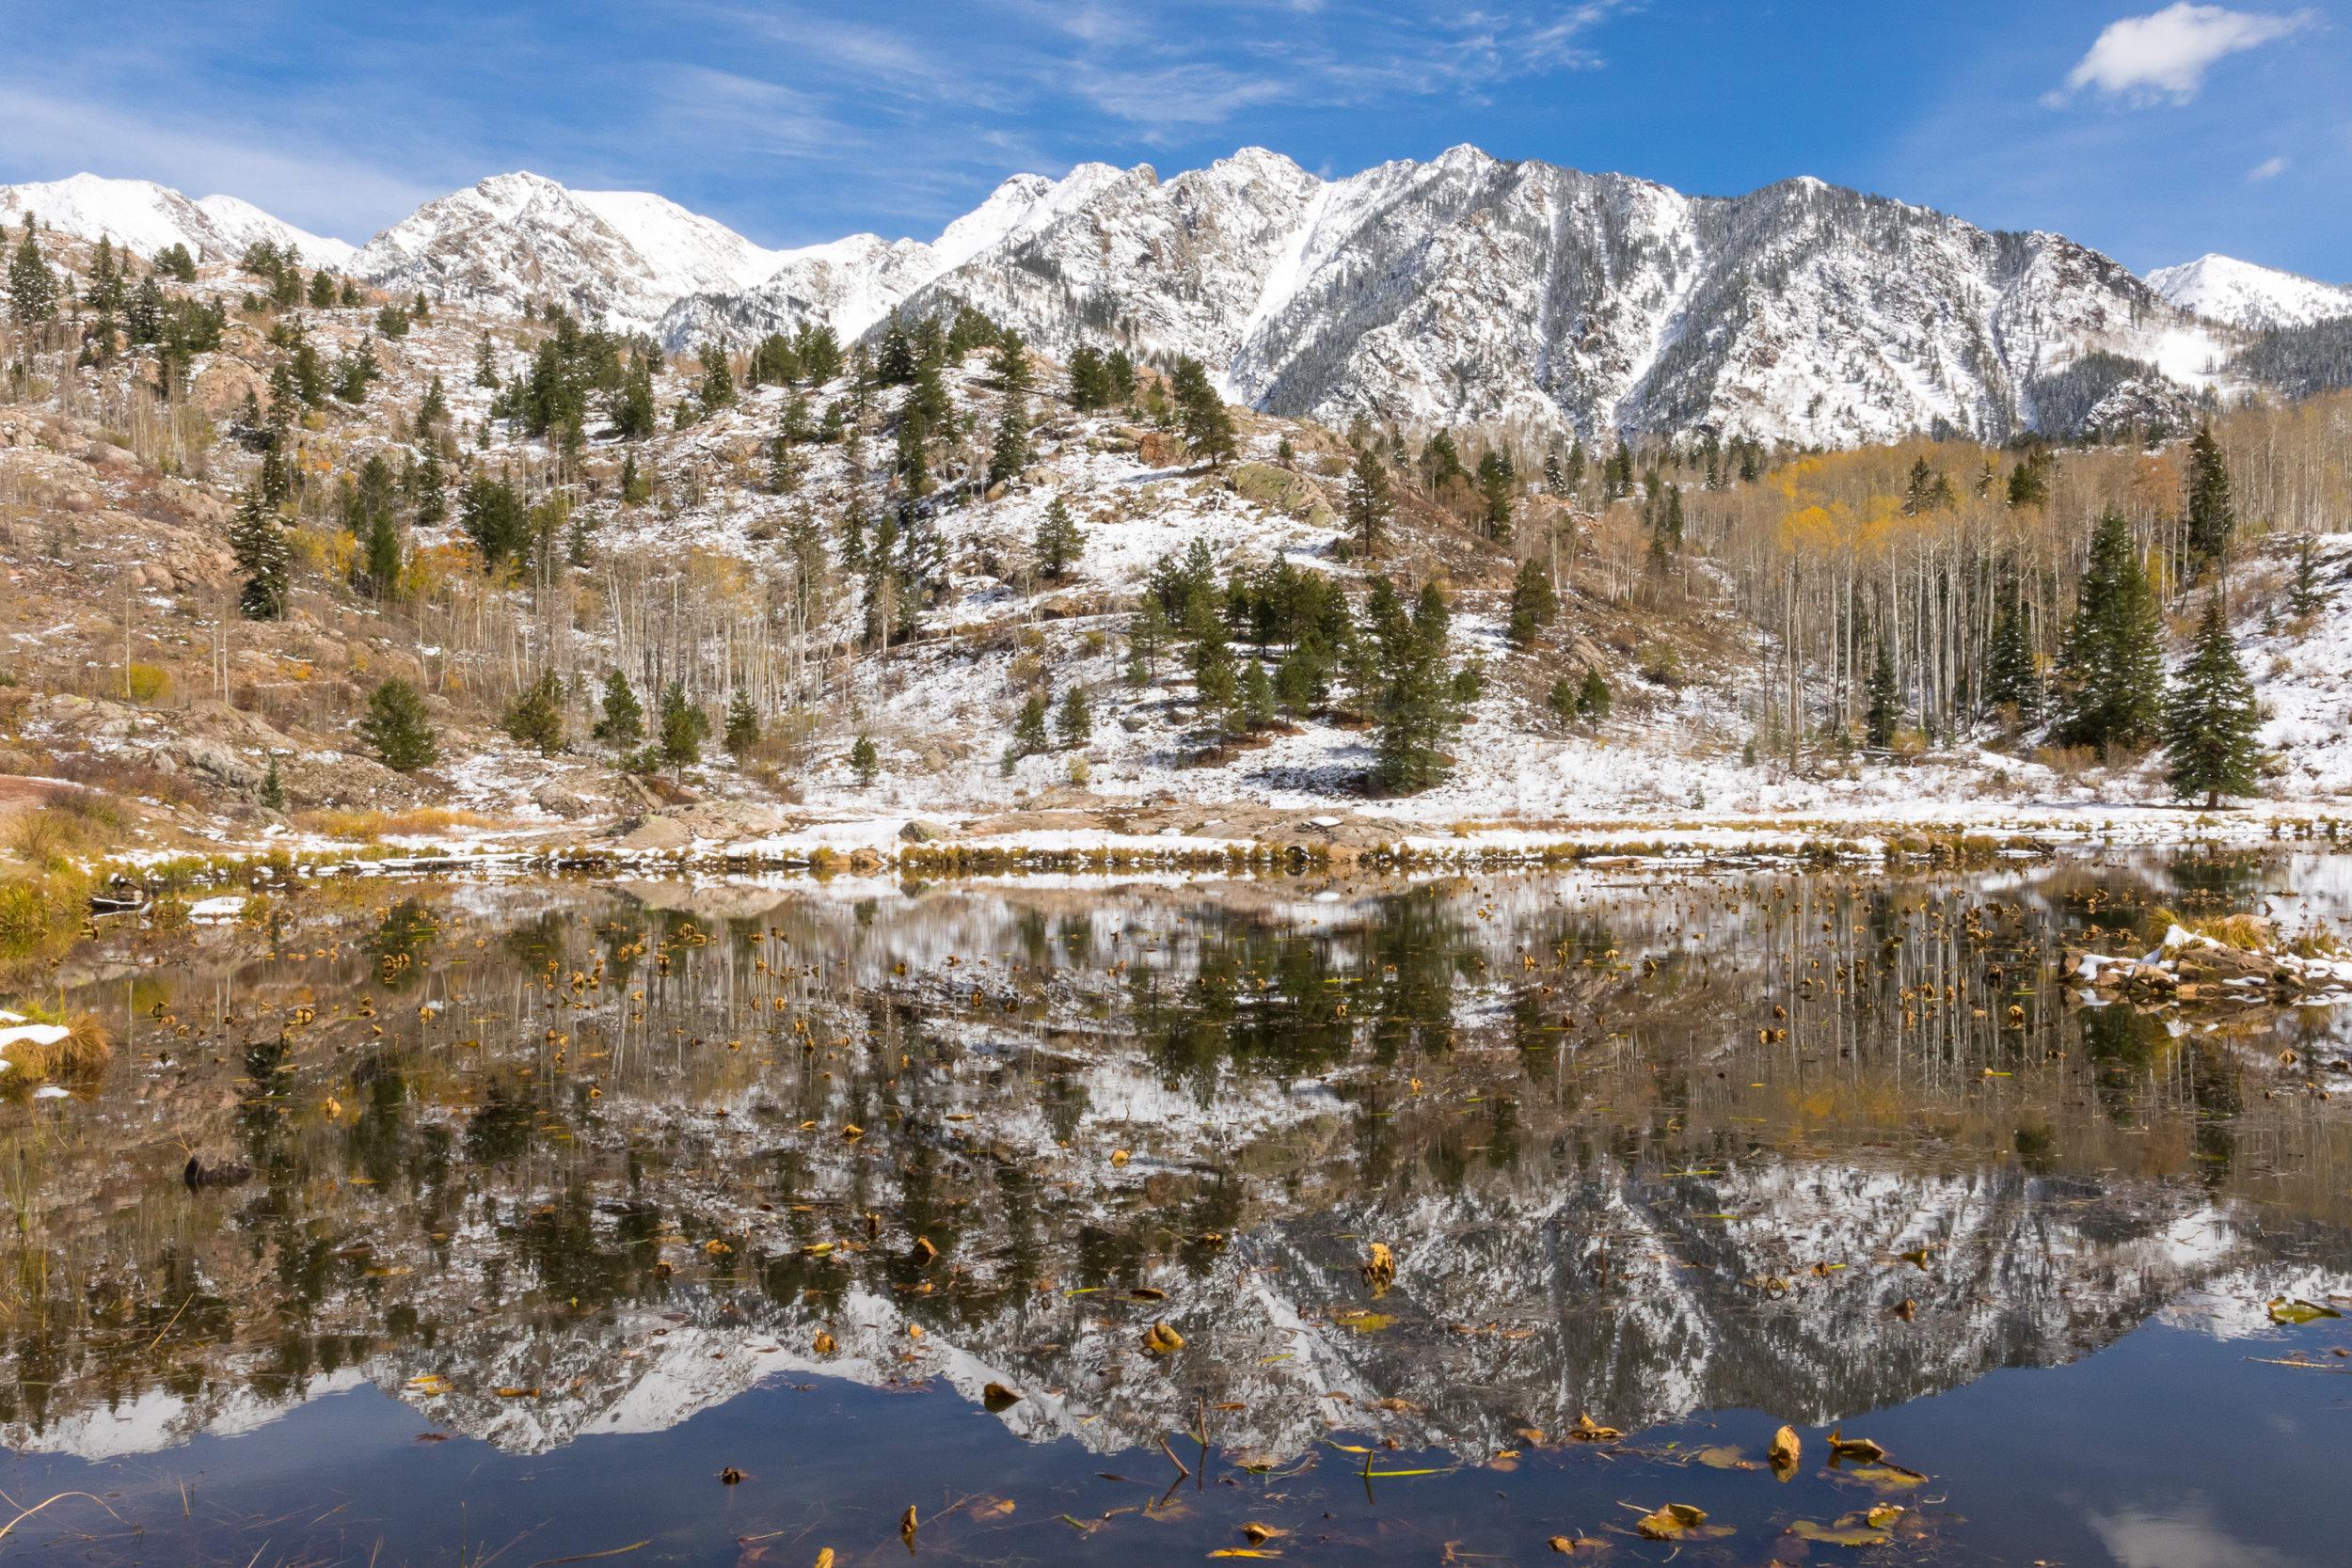 Spud Lake, Image # 0281